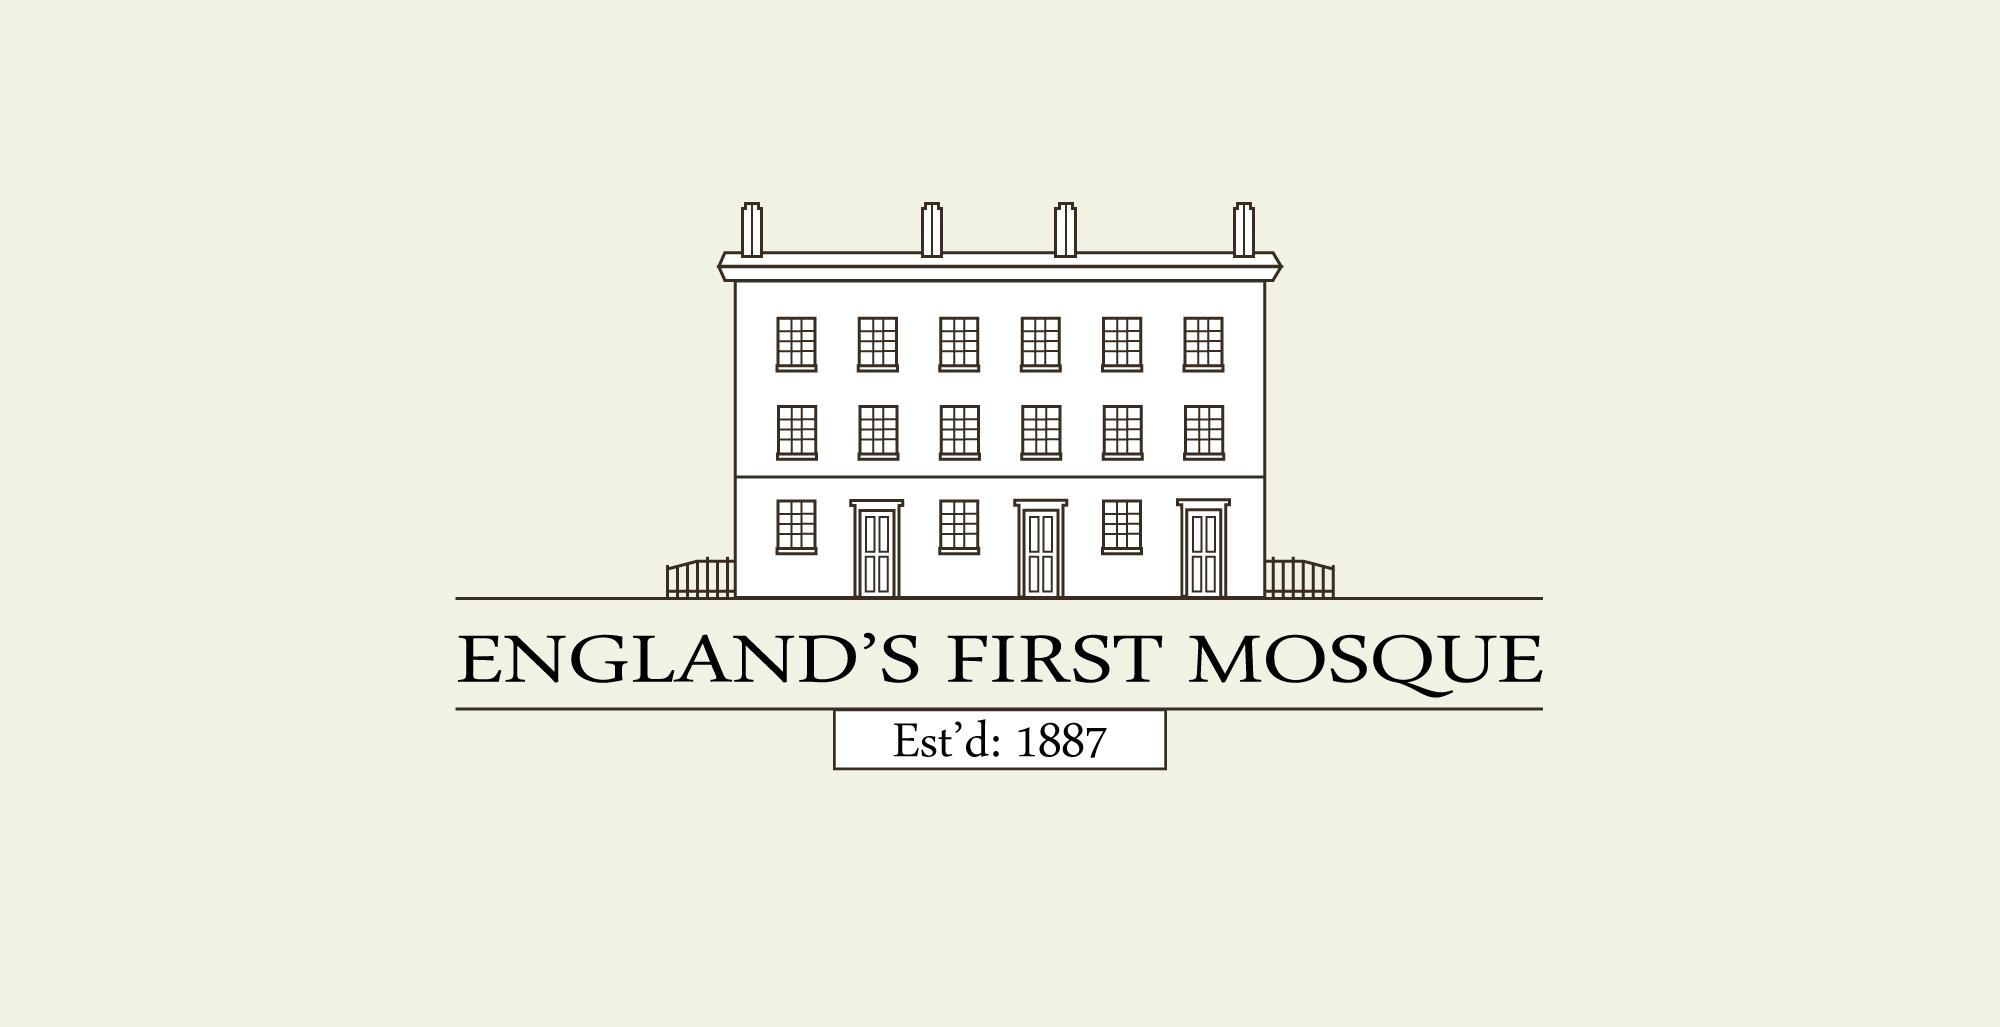 England's First Mosque Exterior